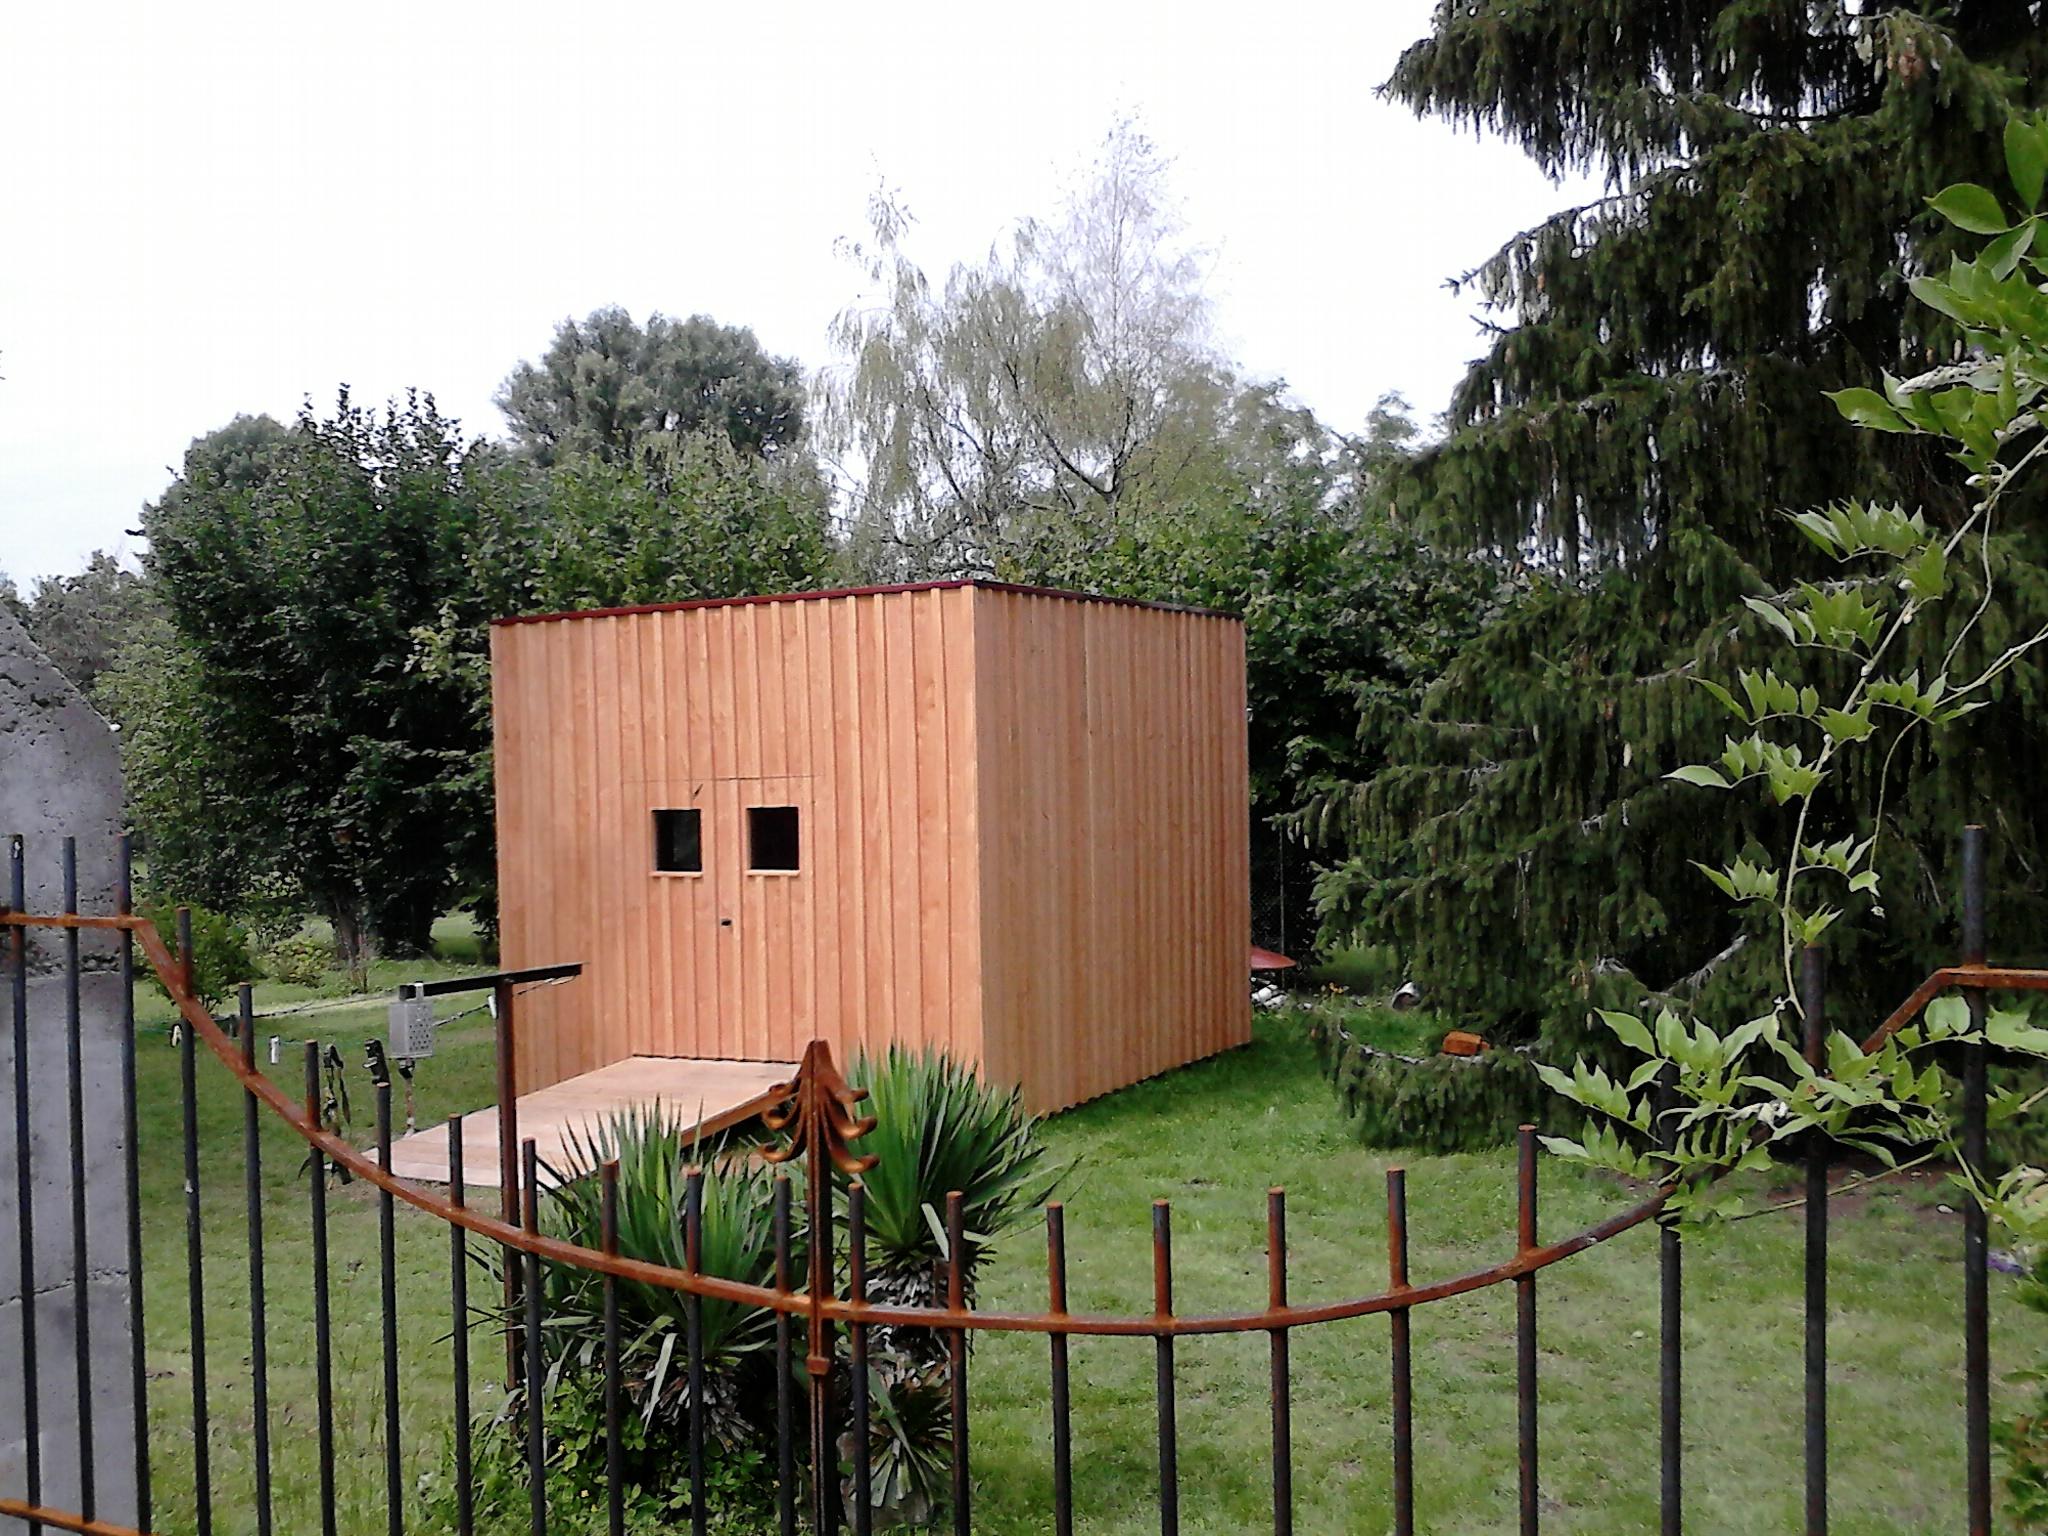 Awesome cabanon de jardin contemporain photos for Abri jardin 10m2